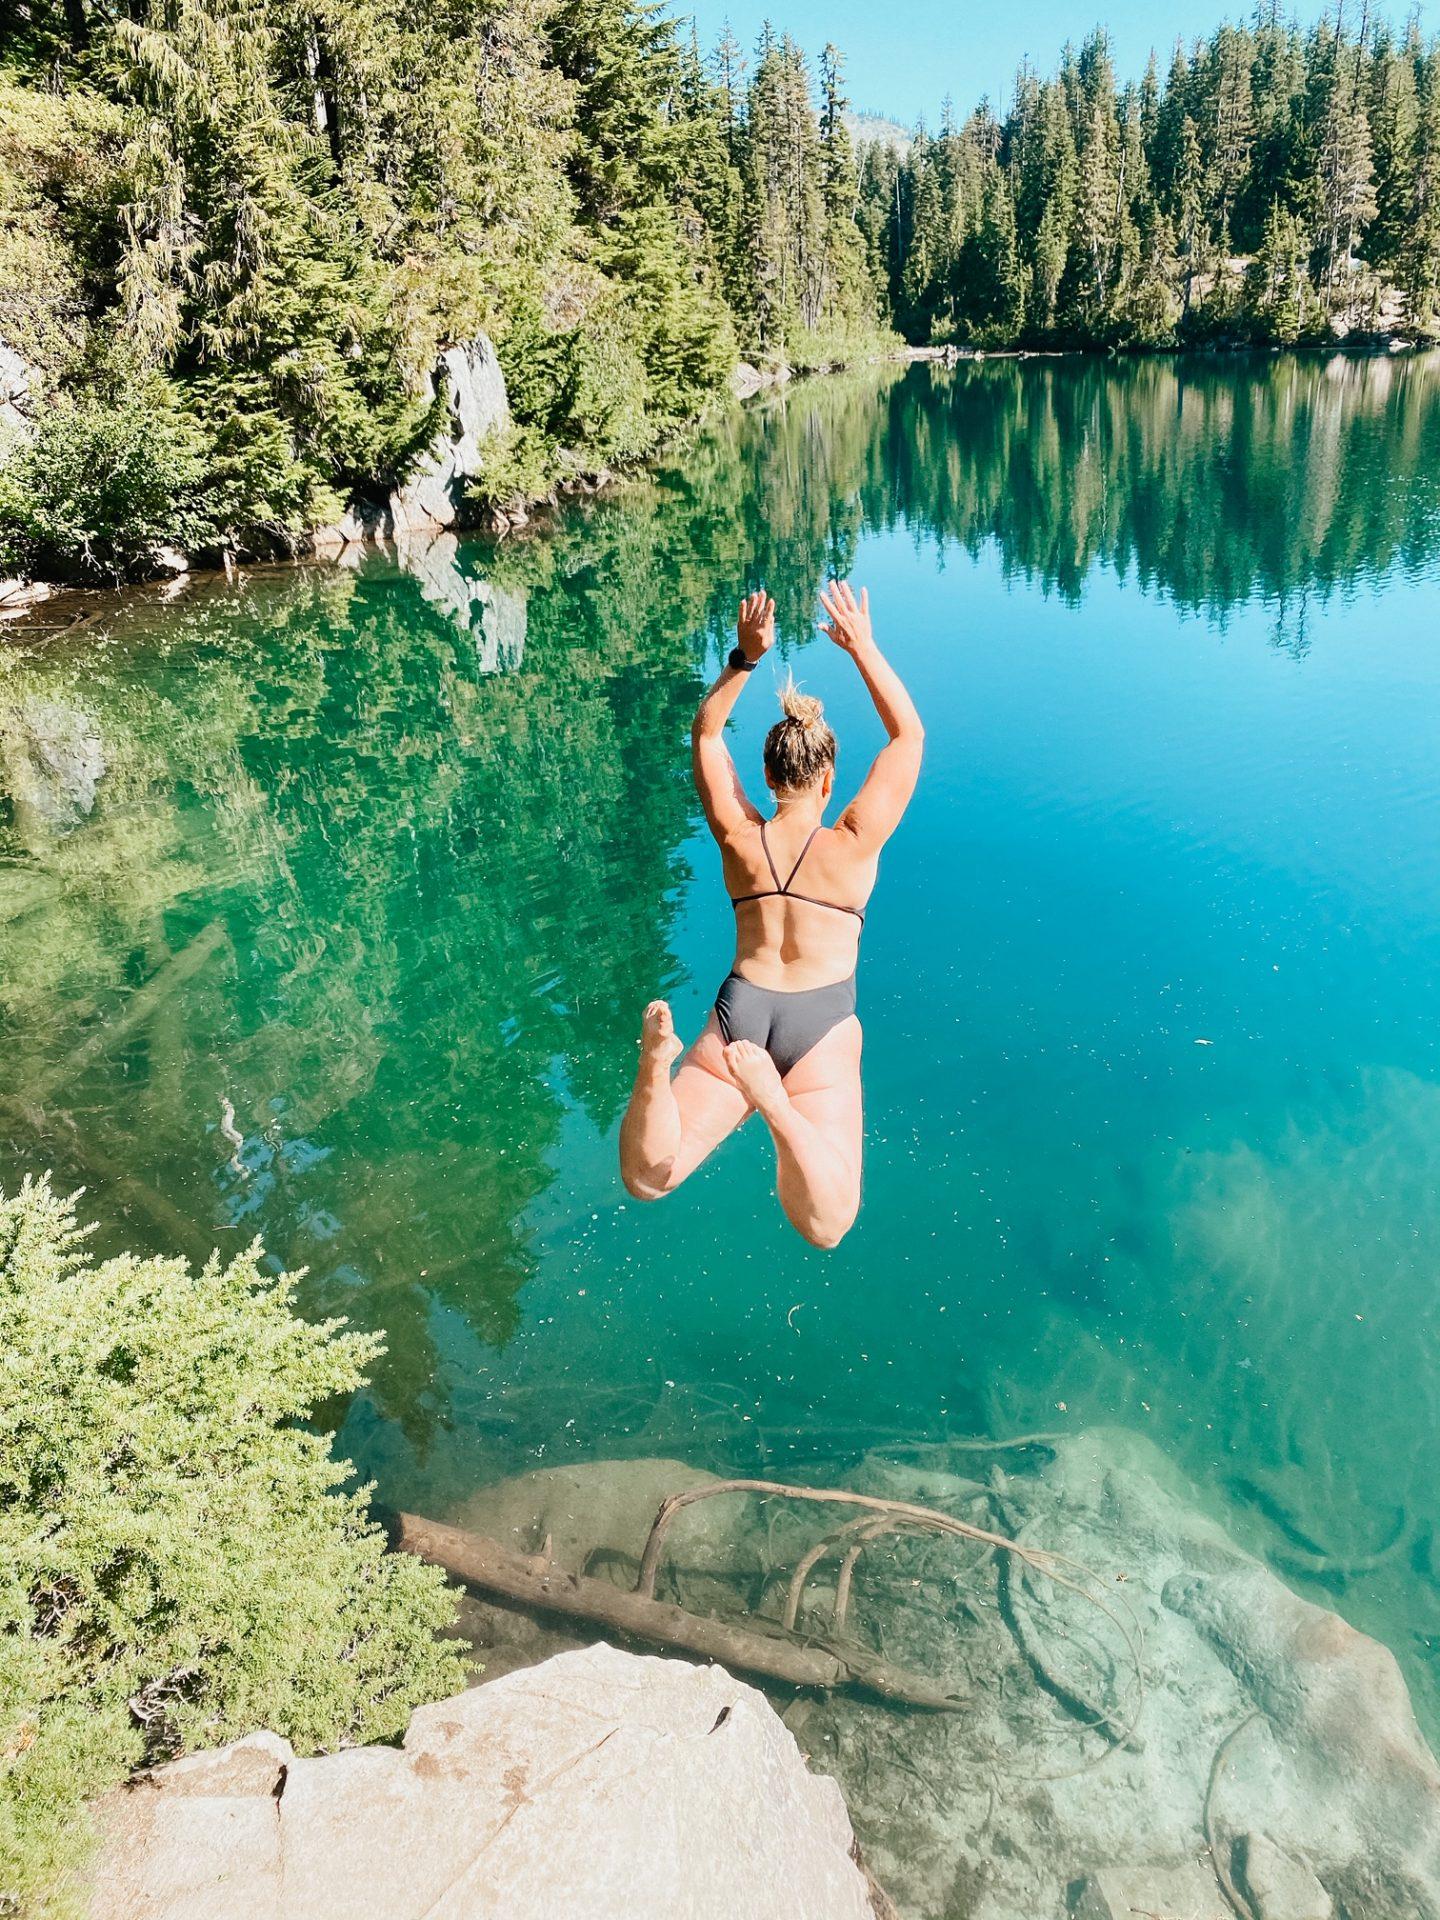 swimming mt. rainier national park